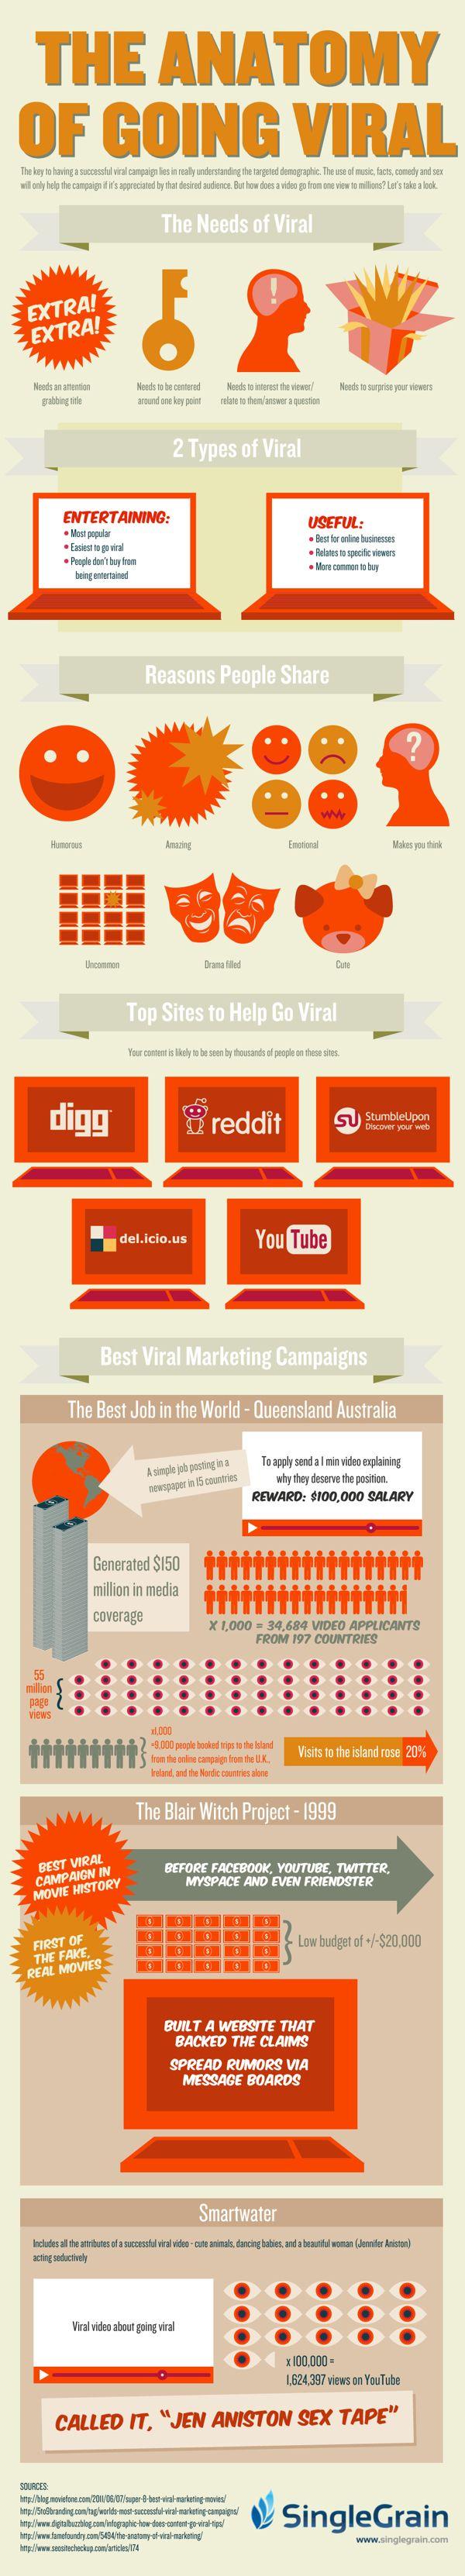 Cómo realizar campañas virales #infografía #infographics #viral #marketing